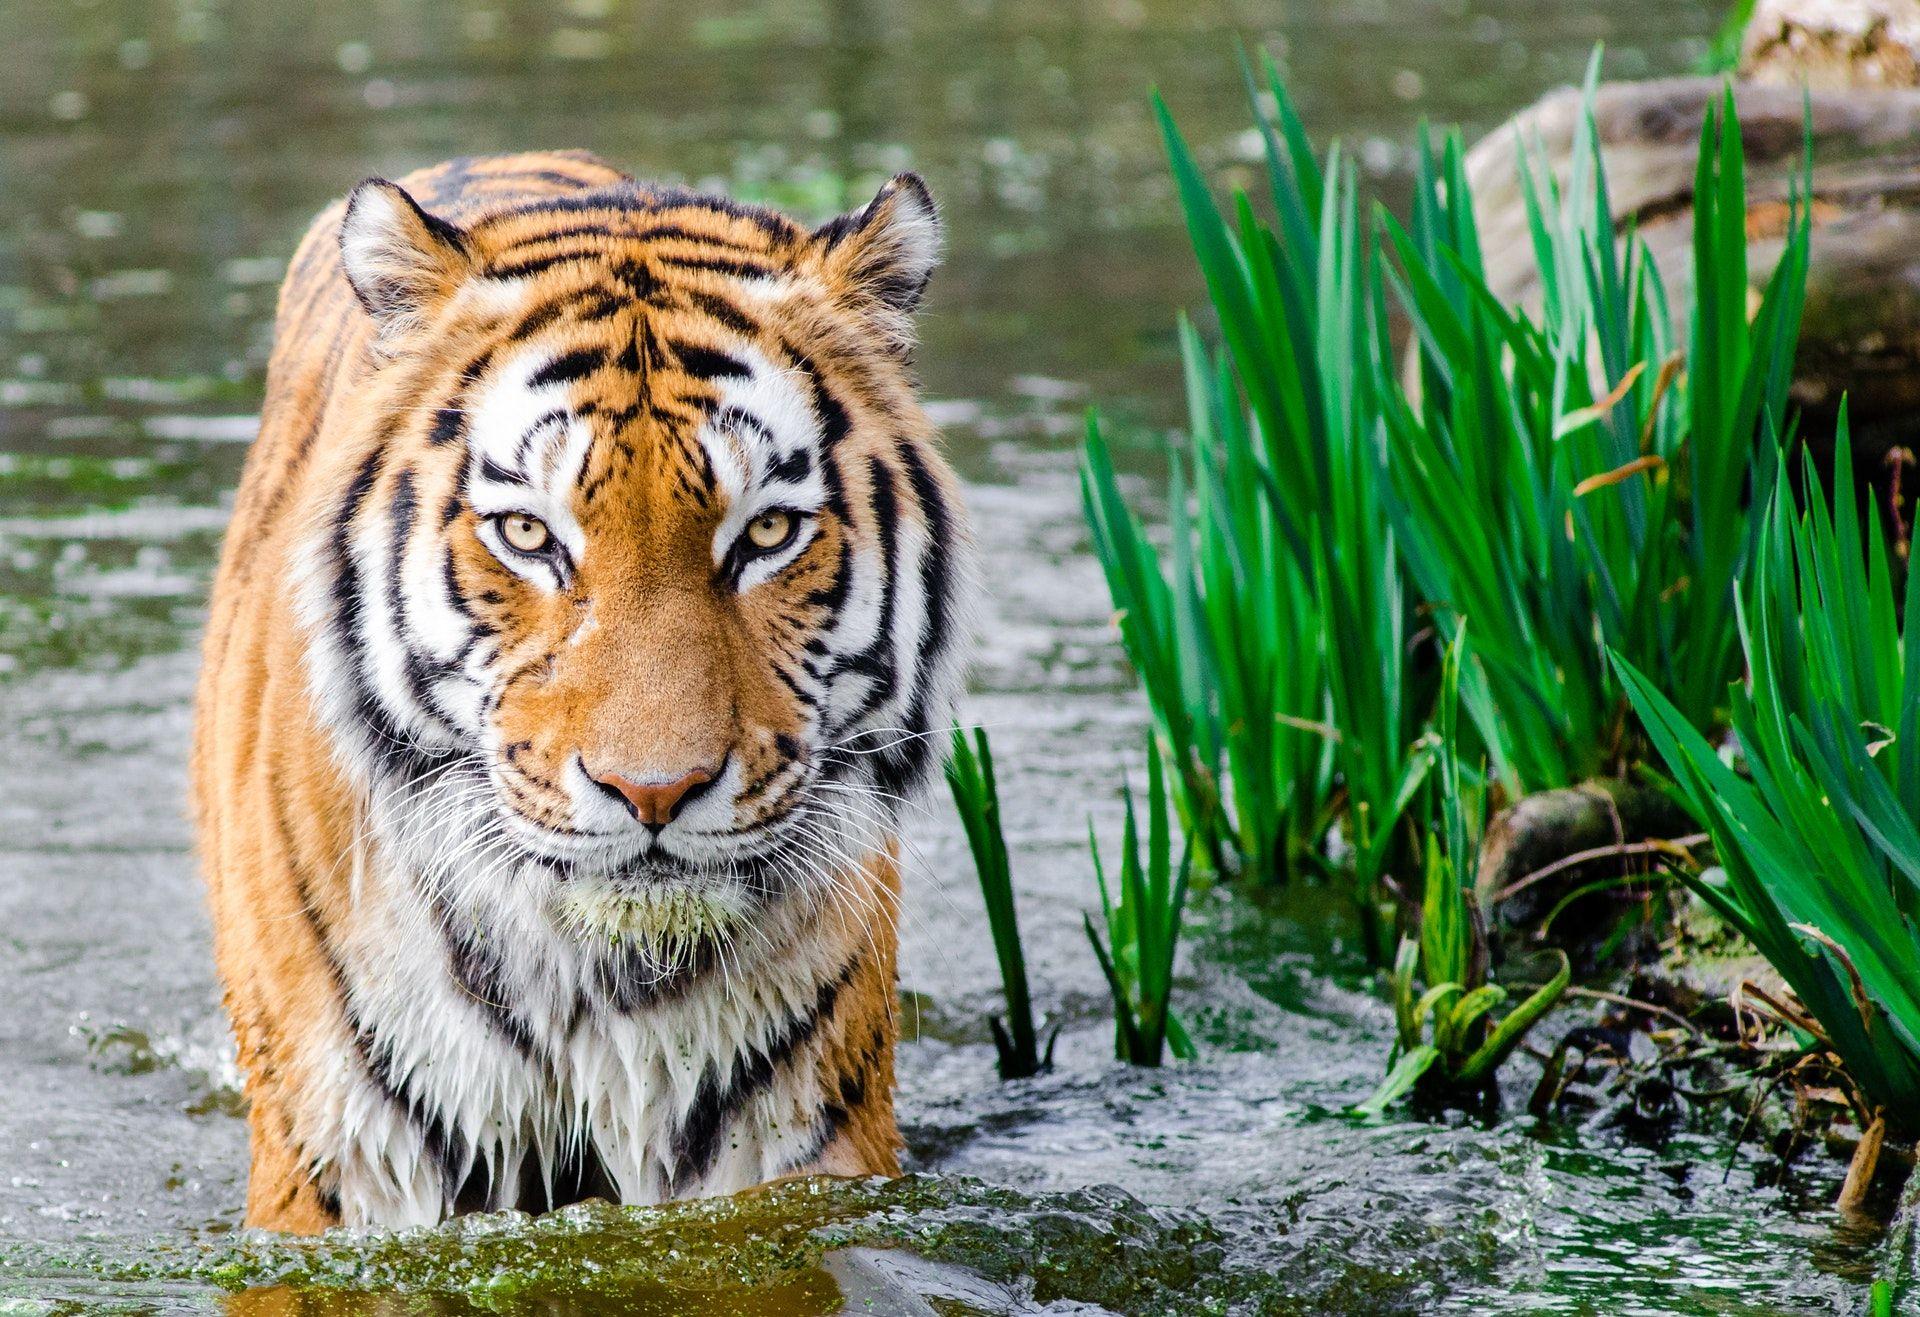 عکس زمینه ببر بنگال در آب پس زمینه